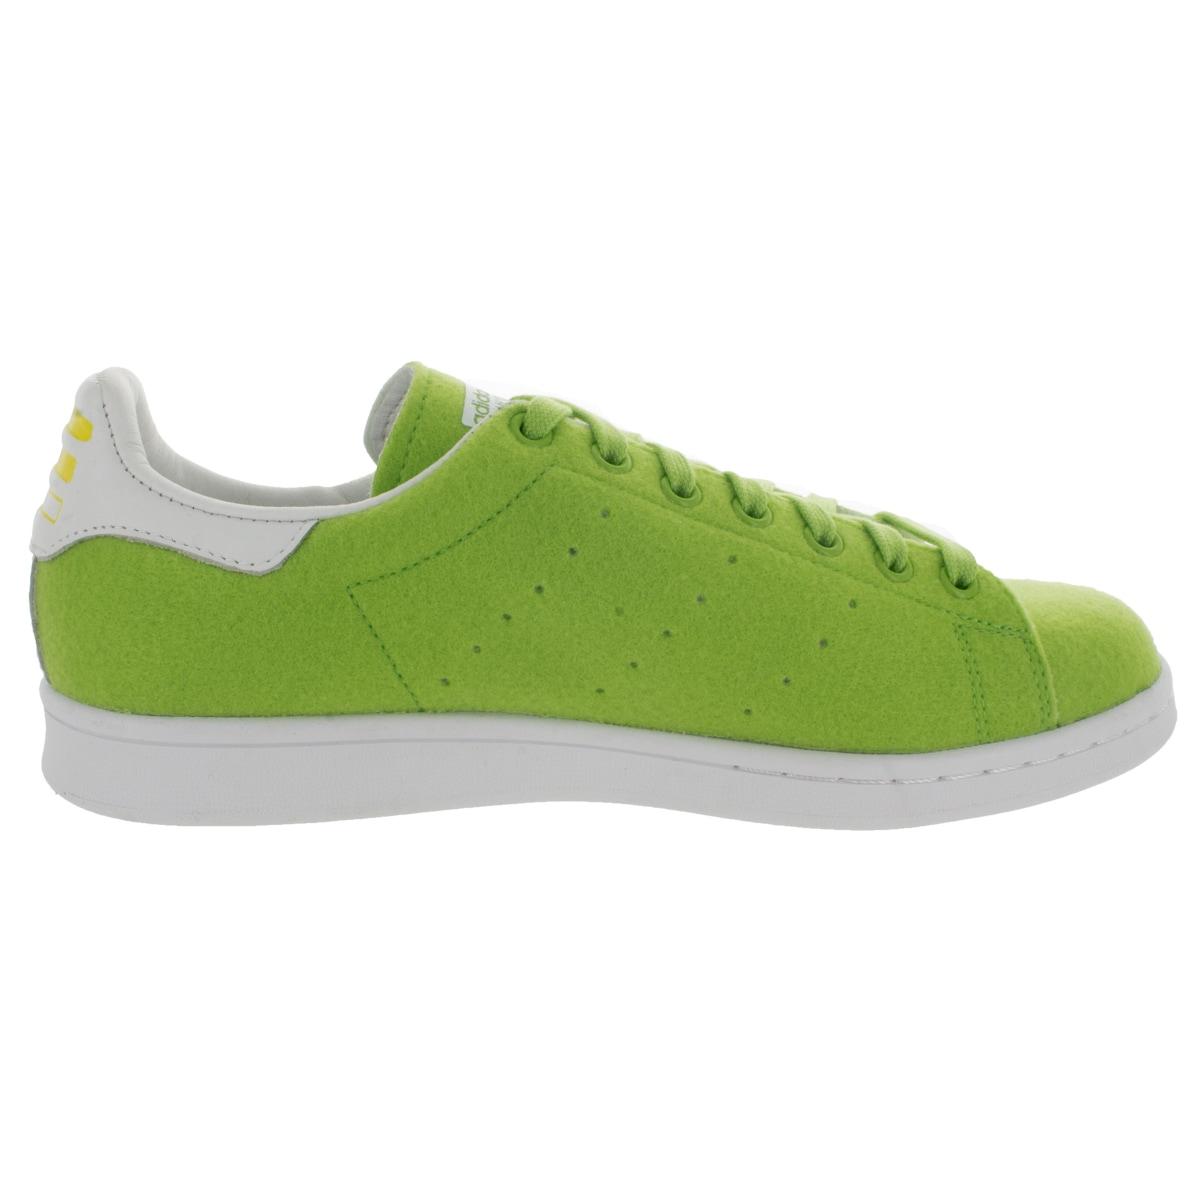 20c4a3259381 Shop Adidas Men s Pw Stan Smith Tns Originals Green Green White Casual Shoe  - Free Shipping Today - Overstock.com - 12319892